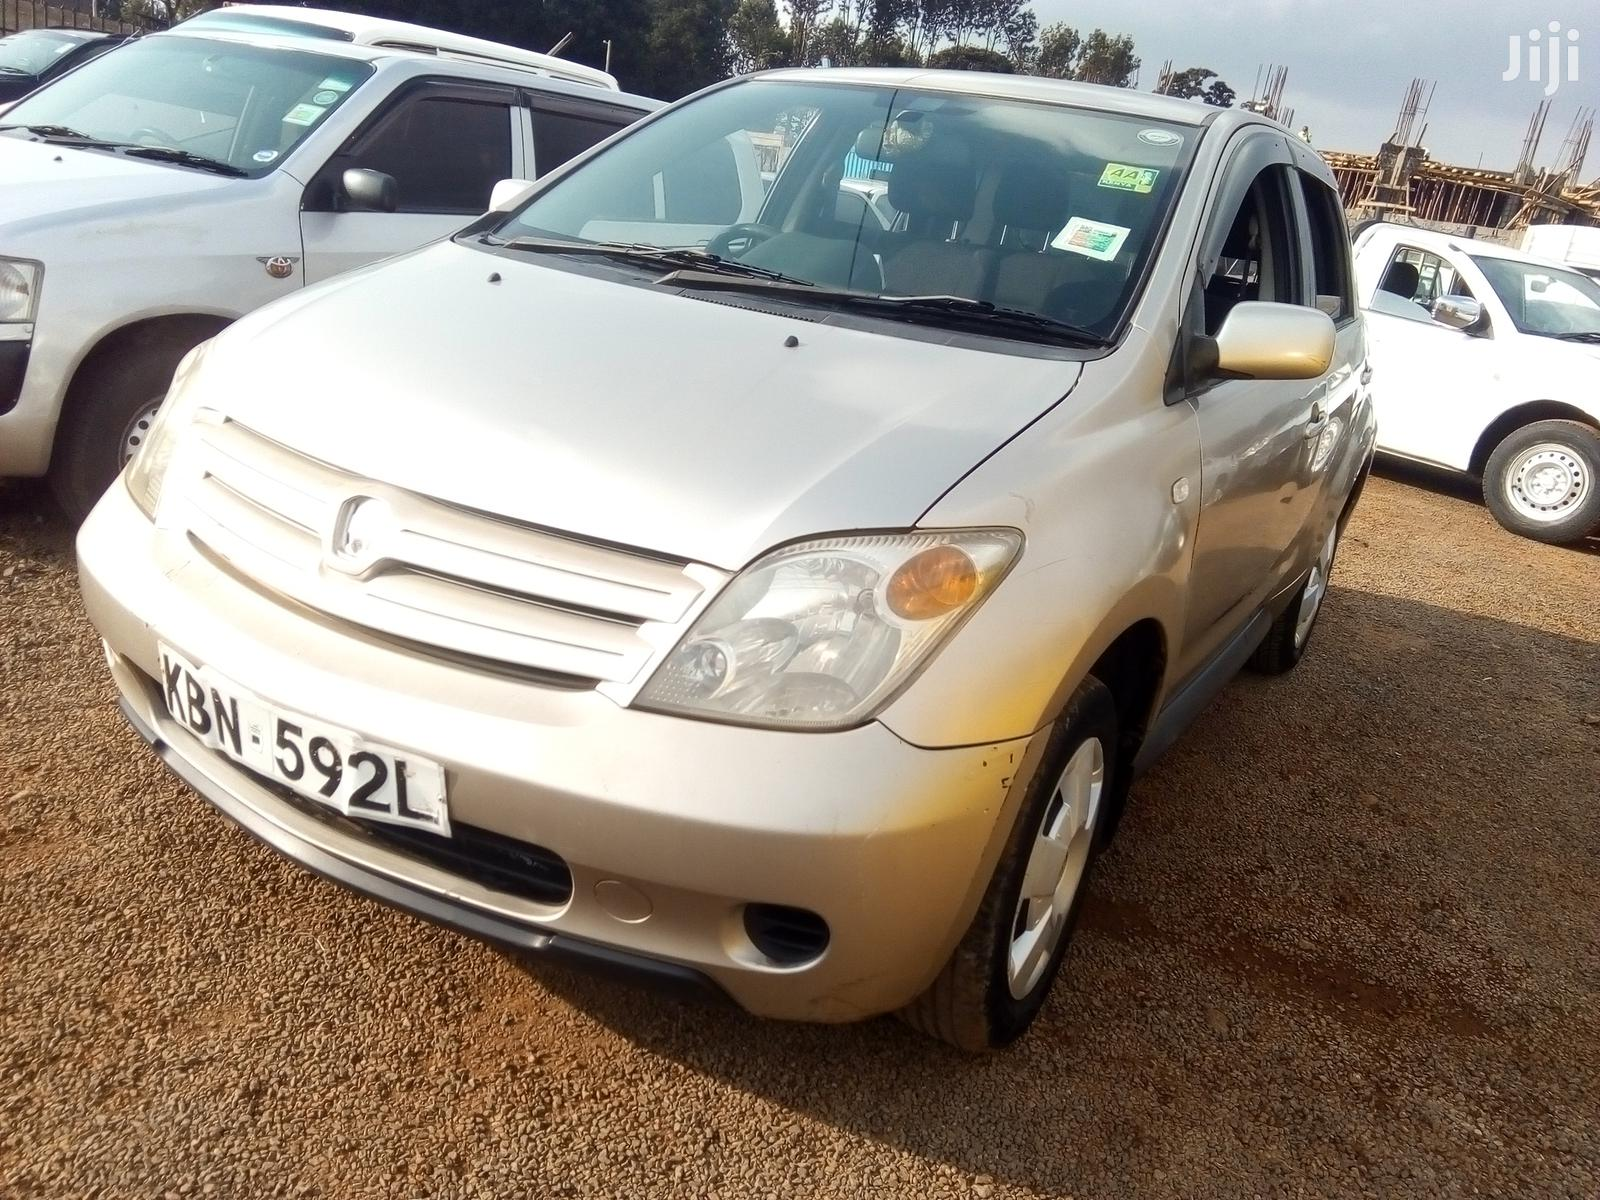 Kelebihan Toyota Ist 2004 Murah Berkualitas